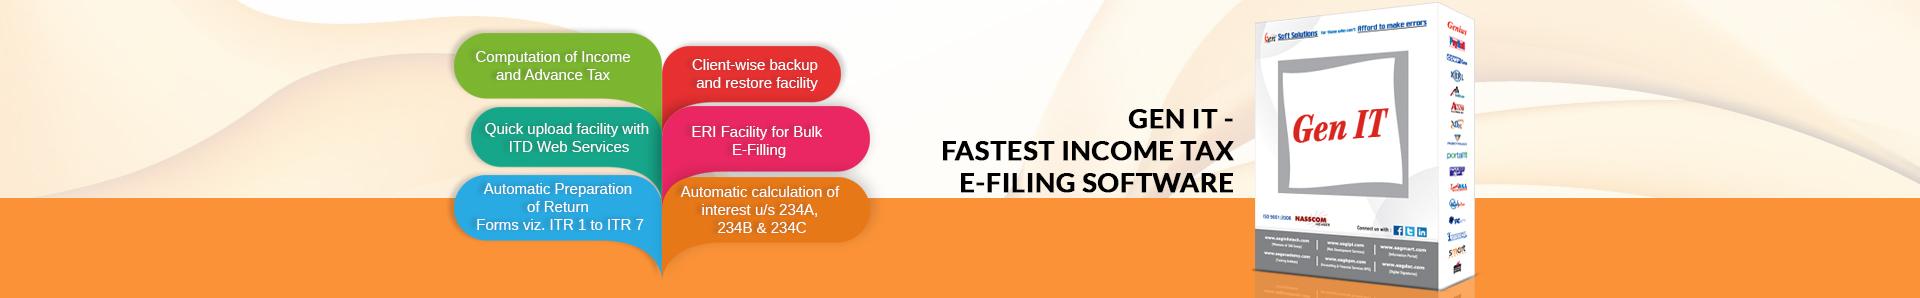 Gen Income Tax Software for Fastest IT Return E Filing | SAG